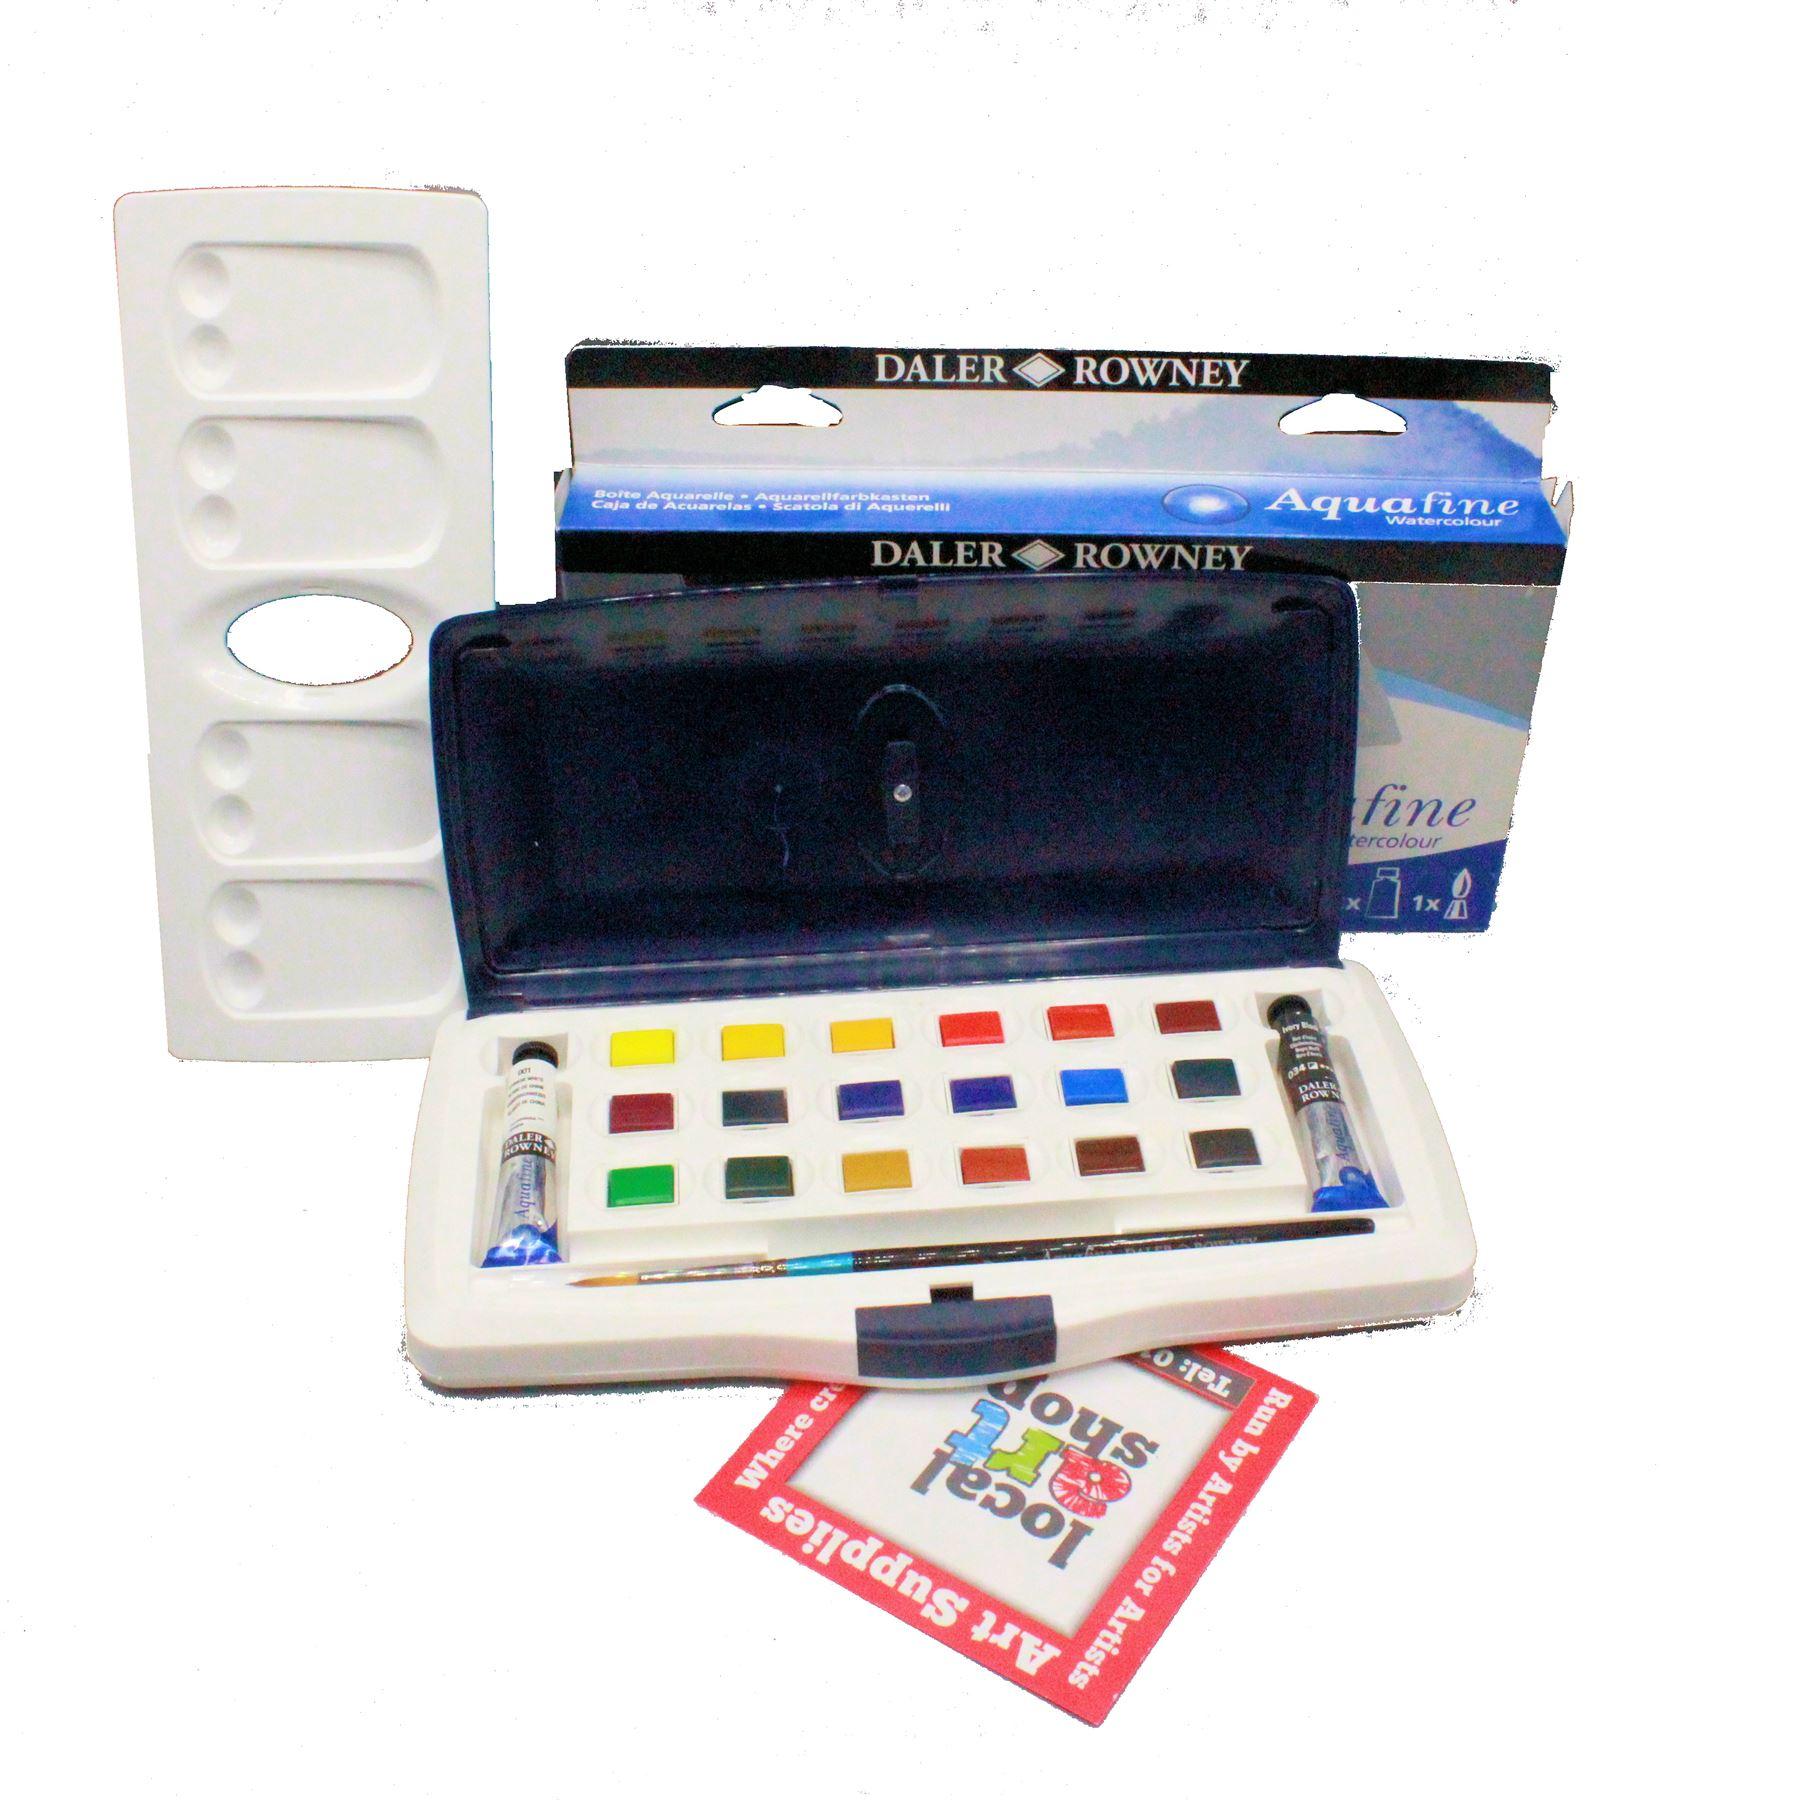 Daler Rowney Aquafine Watercolour Paint 18 Half Pan & 2 Tube X 8ml Slider Box Set